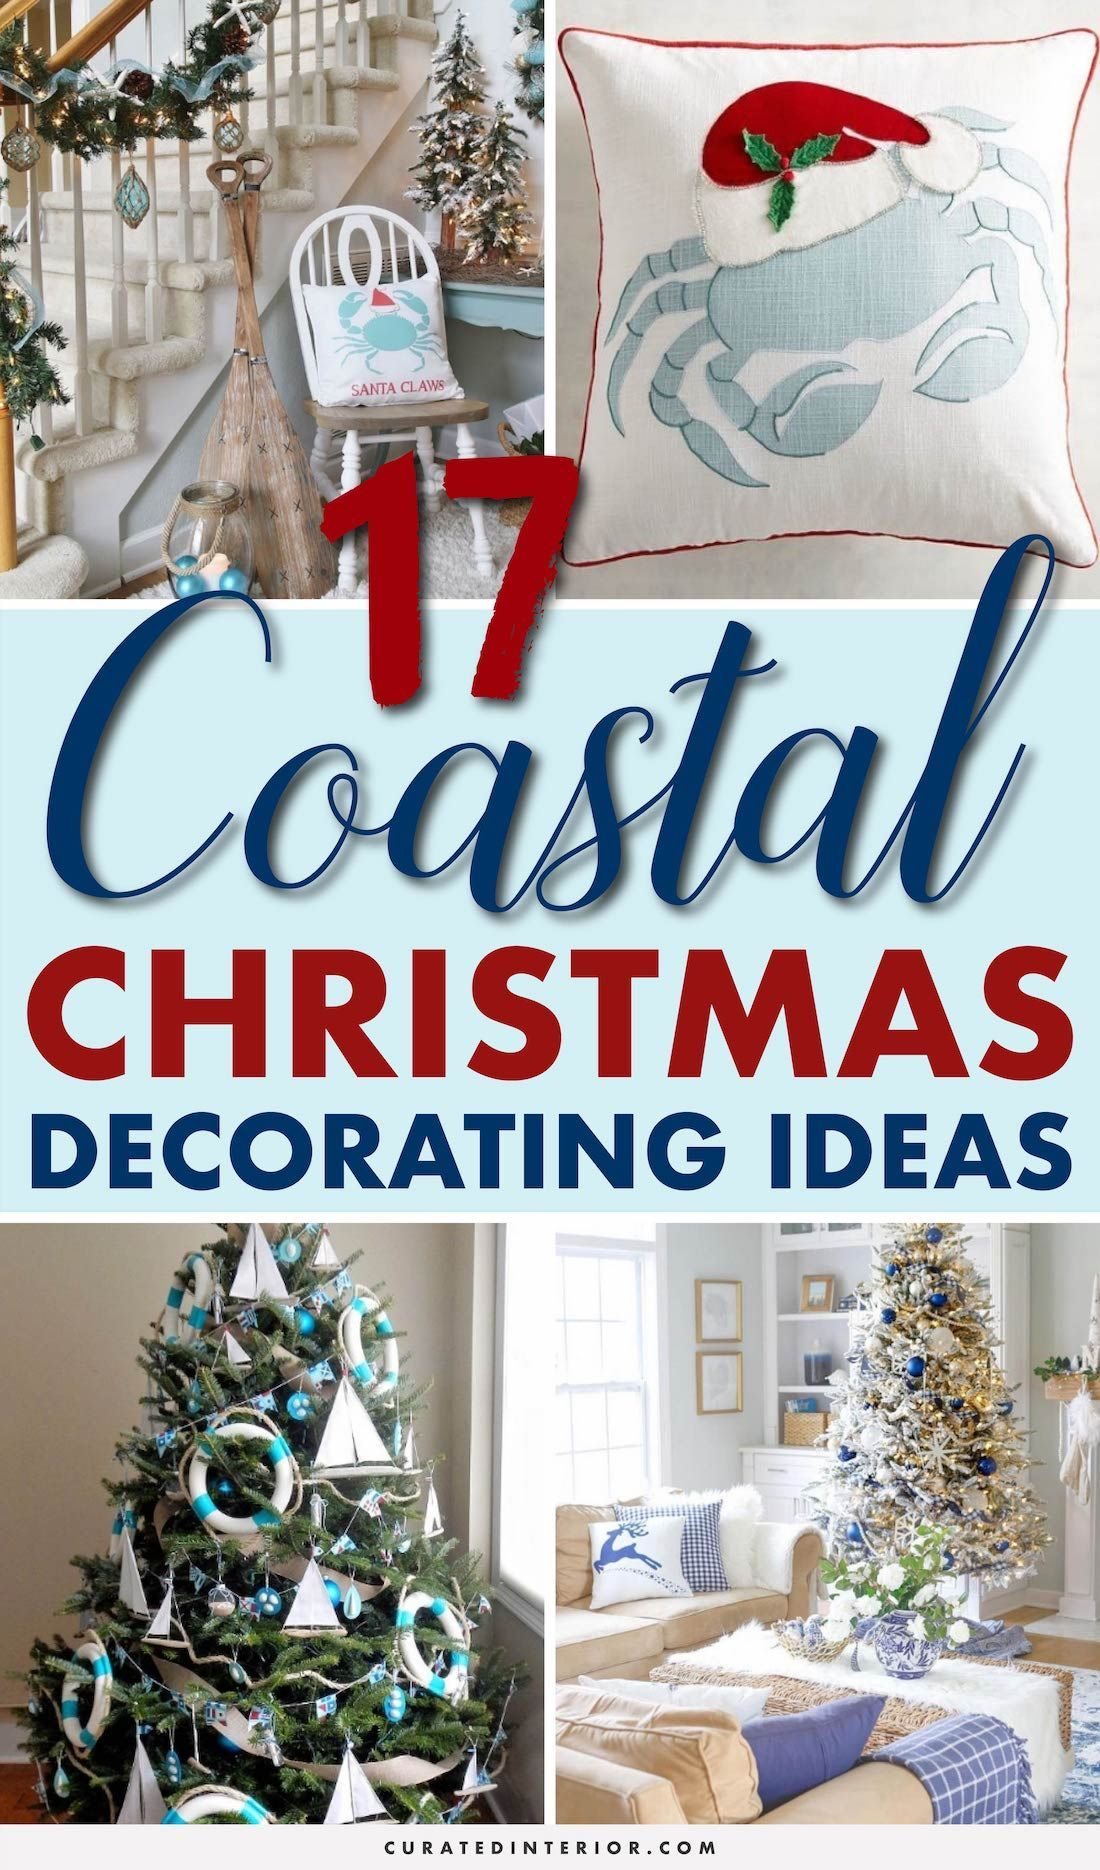 17 Coastal Christmas Decorating Ideas Coastaldecor Christmasdecor Coastalchristmas